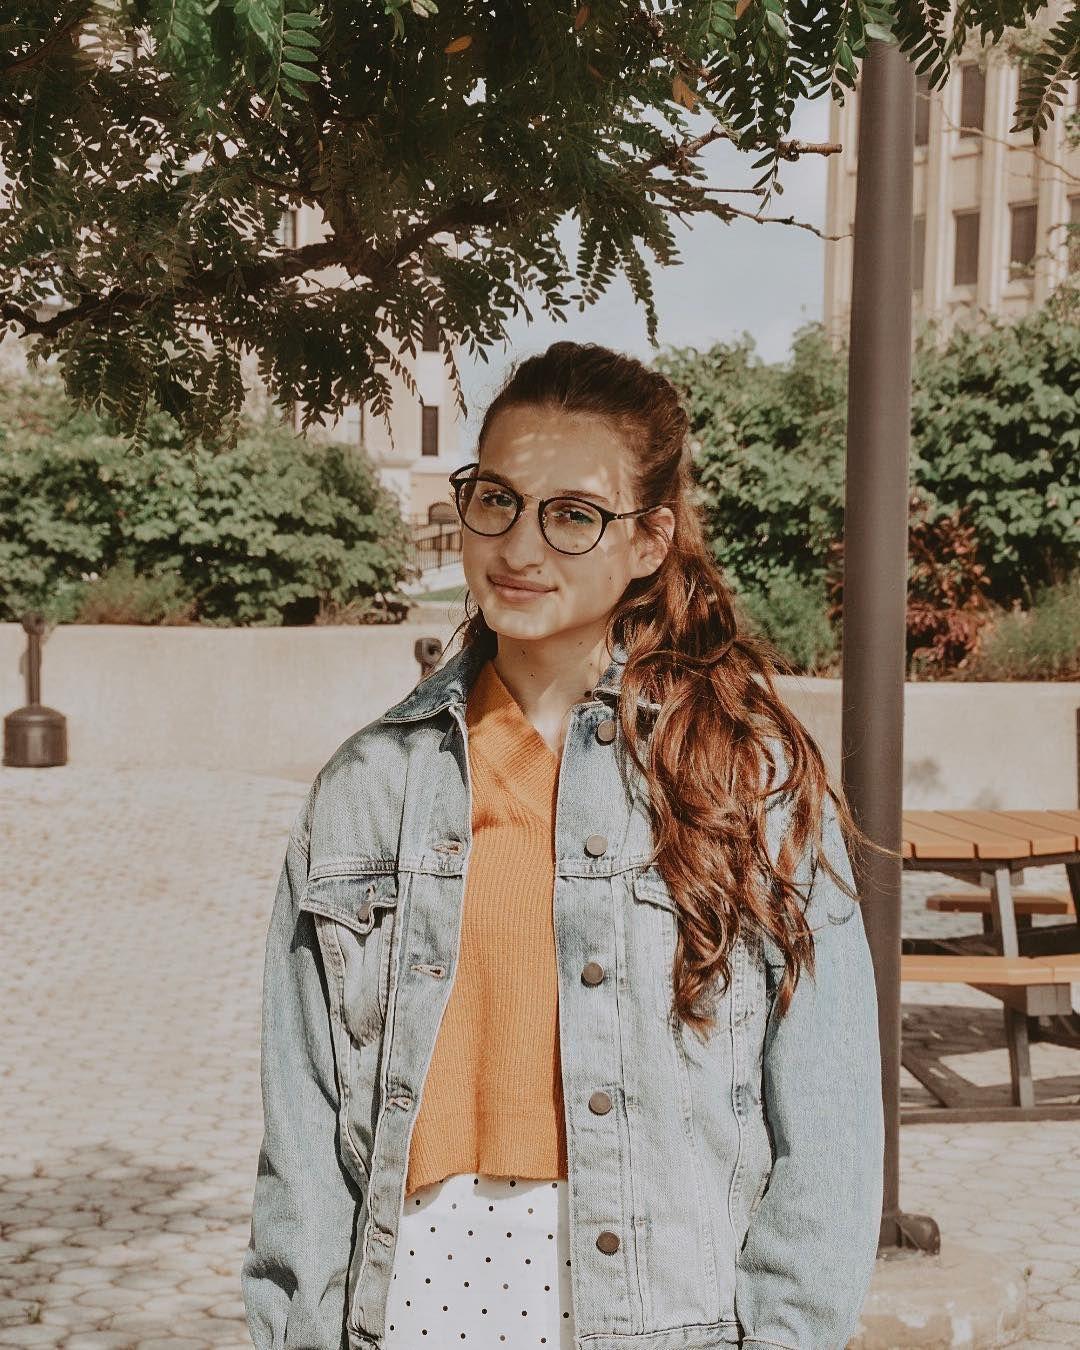 ca7d16e0701f67 Camille eyeglasses in Amber for women and men - Shop Eyeglasses    Sunglasses Online - Rx Glasses   TIJN® Eyewear